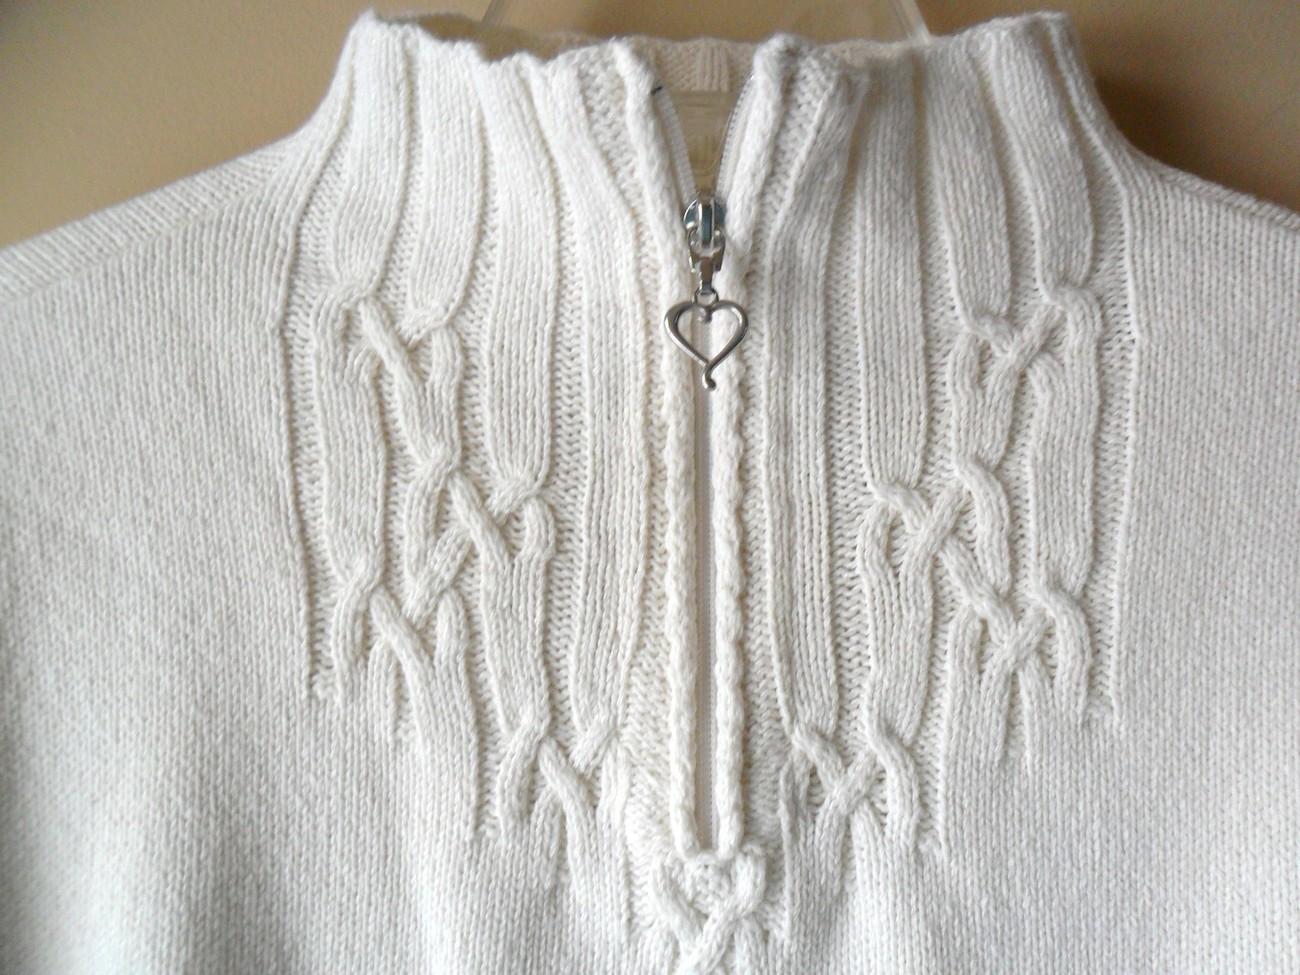 Coldwater Creek Beige Sweater Womens Size SMALL Heart Zipper Front Cabel Knit